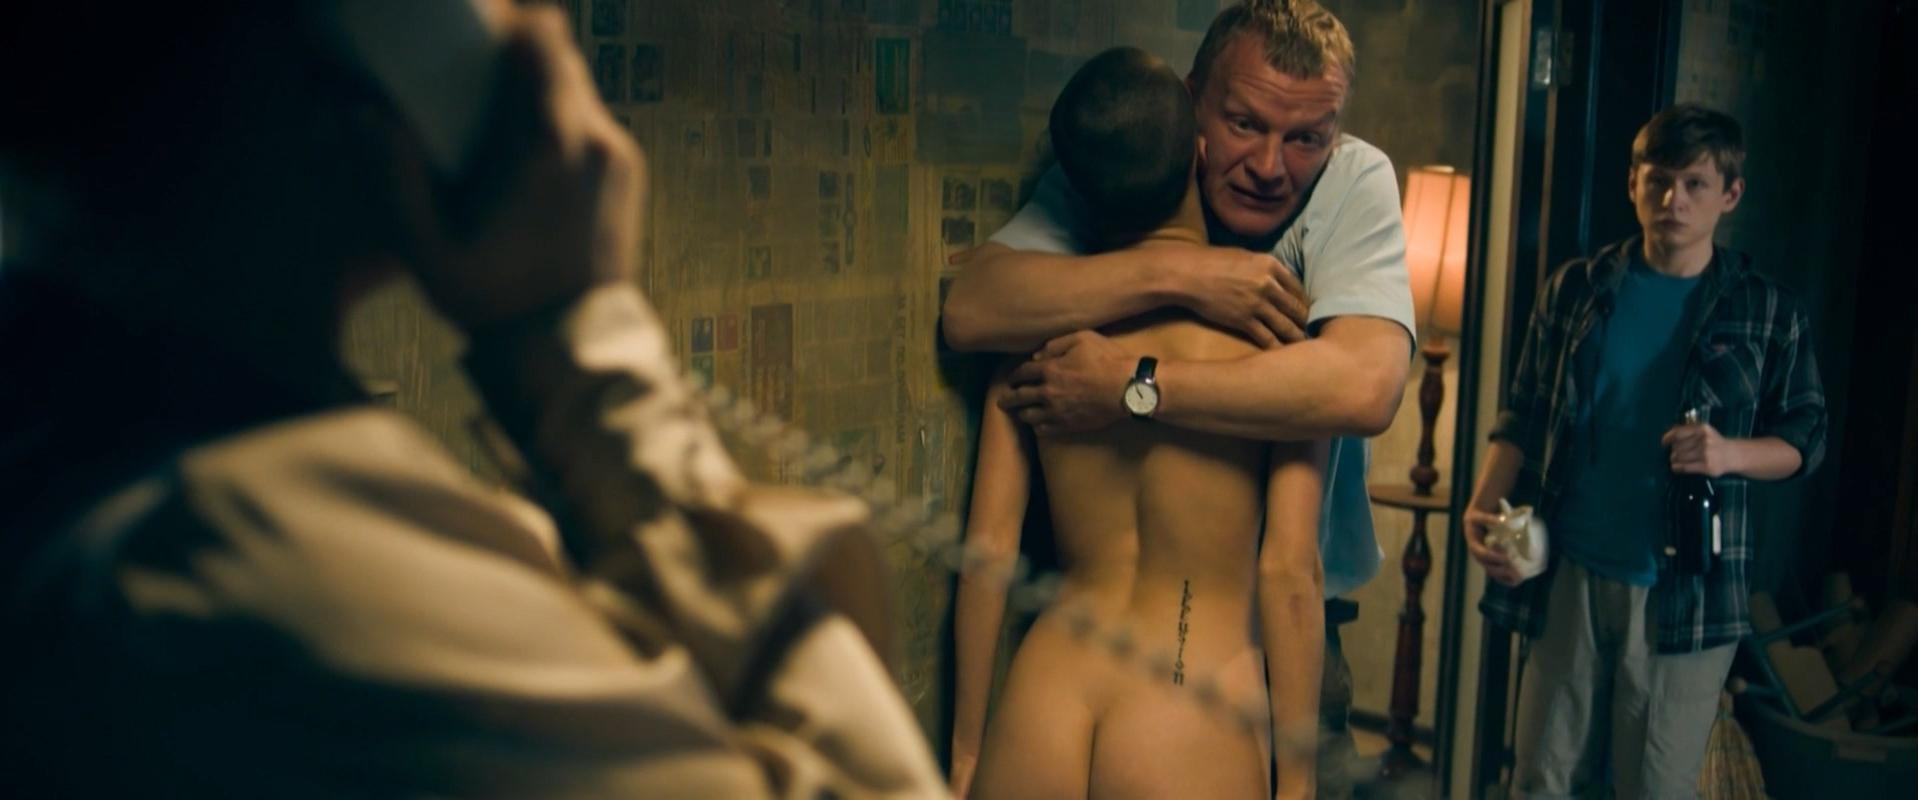 Asya Domskaya nude - Klinch (2015)